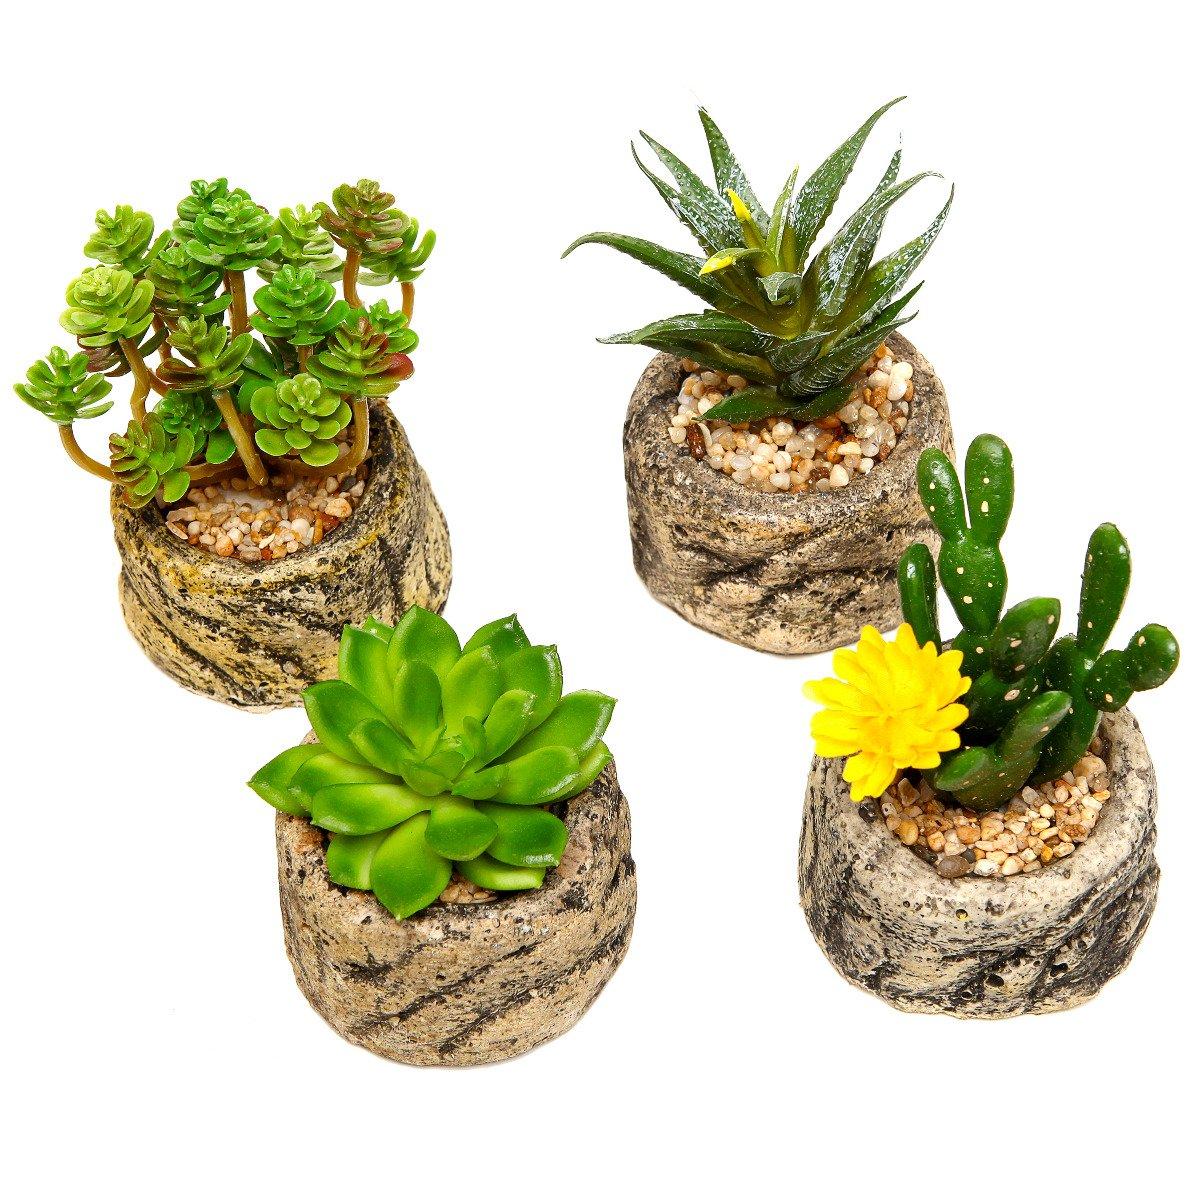 Amazon.com : Assorted Set Of 4 Green Artificial Faux Mini Succulent Plants  W/ Pebble Sand Potted Stone Like Cement Pot : Garden U0026 Outdoor